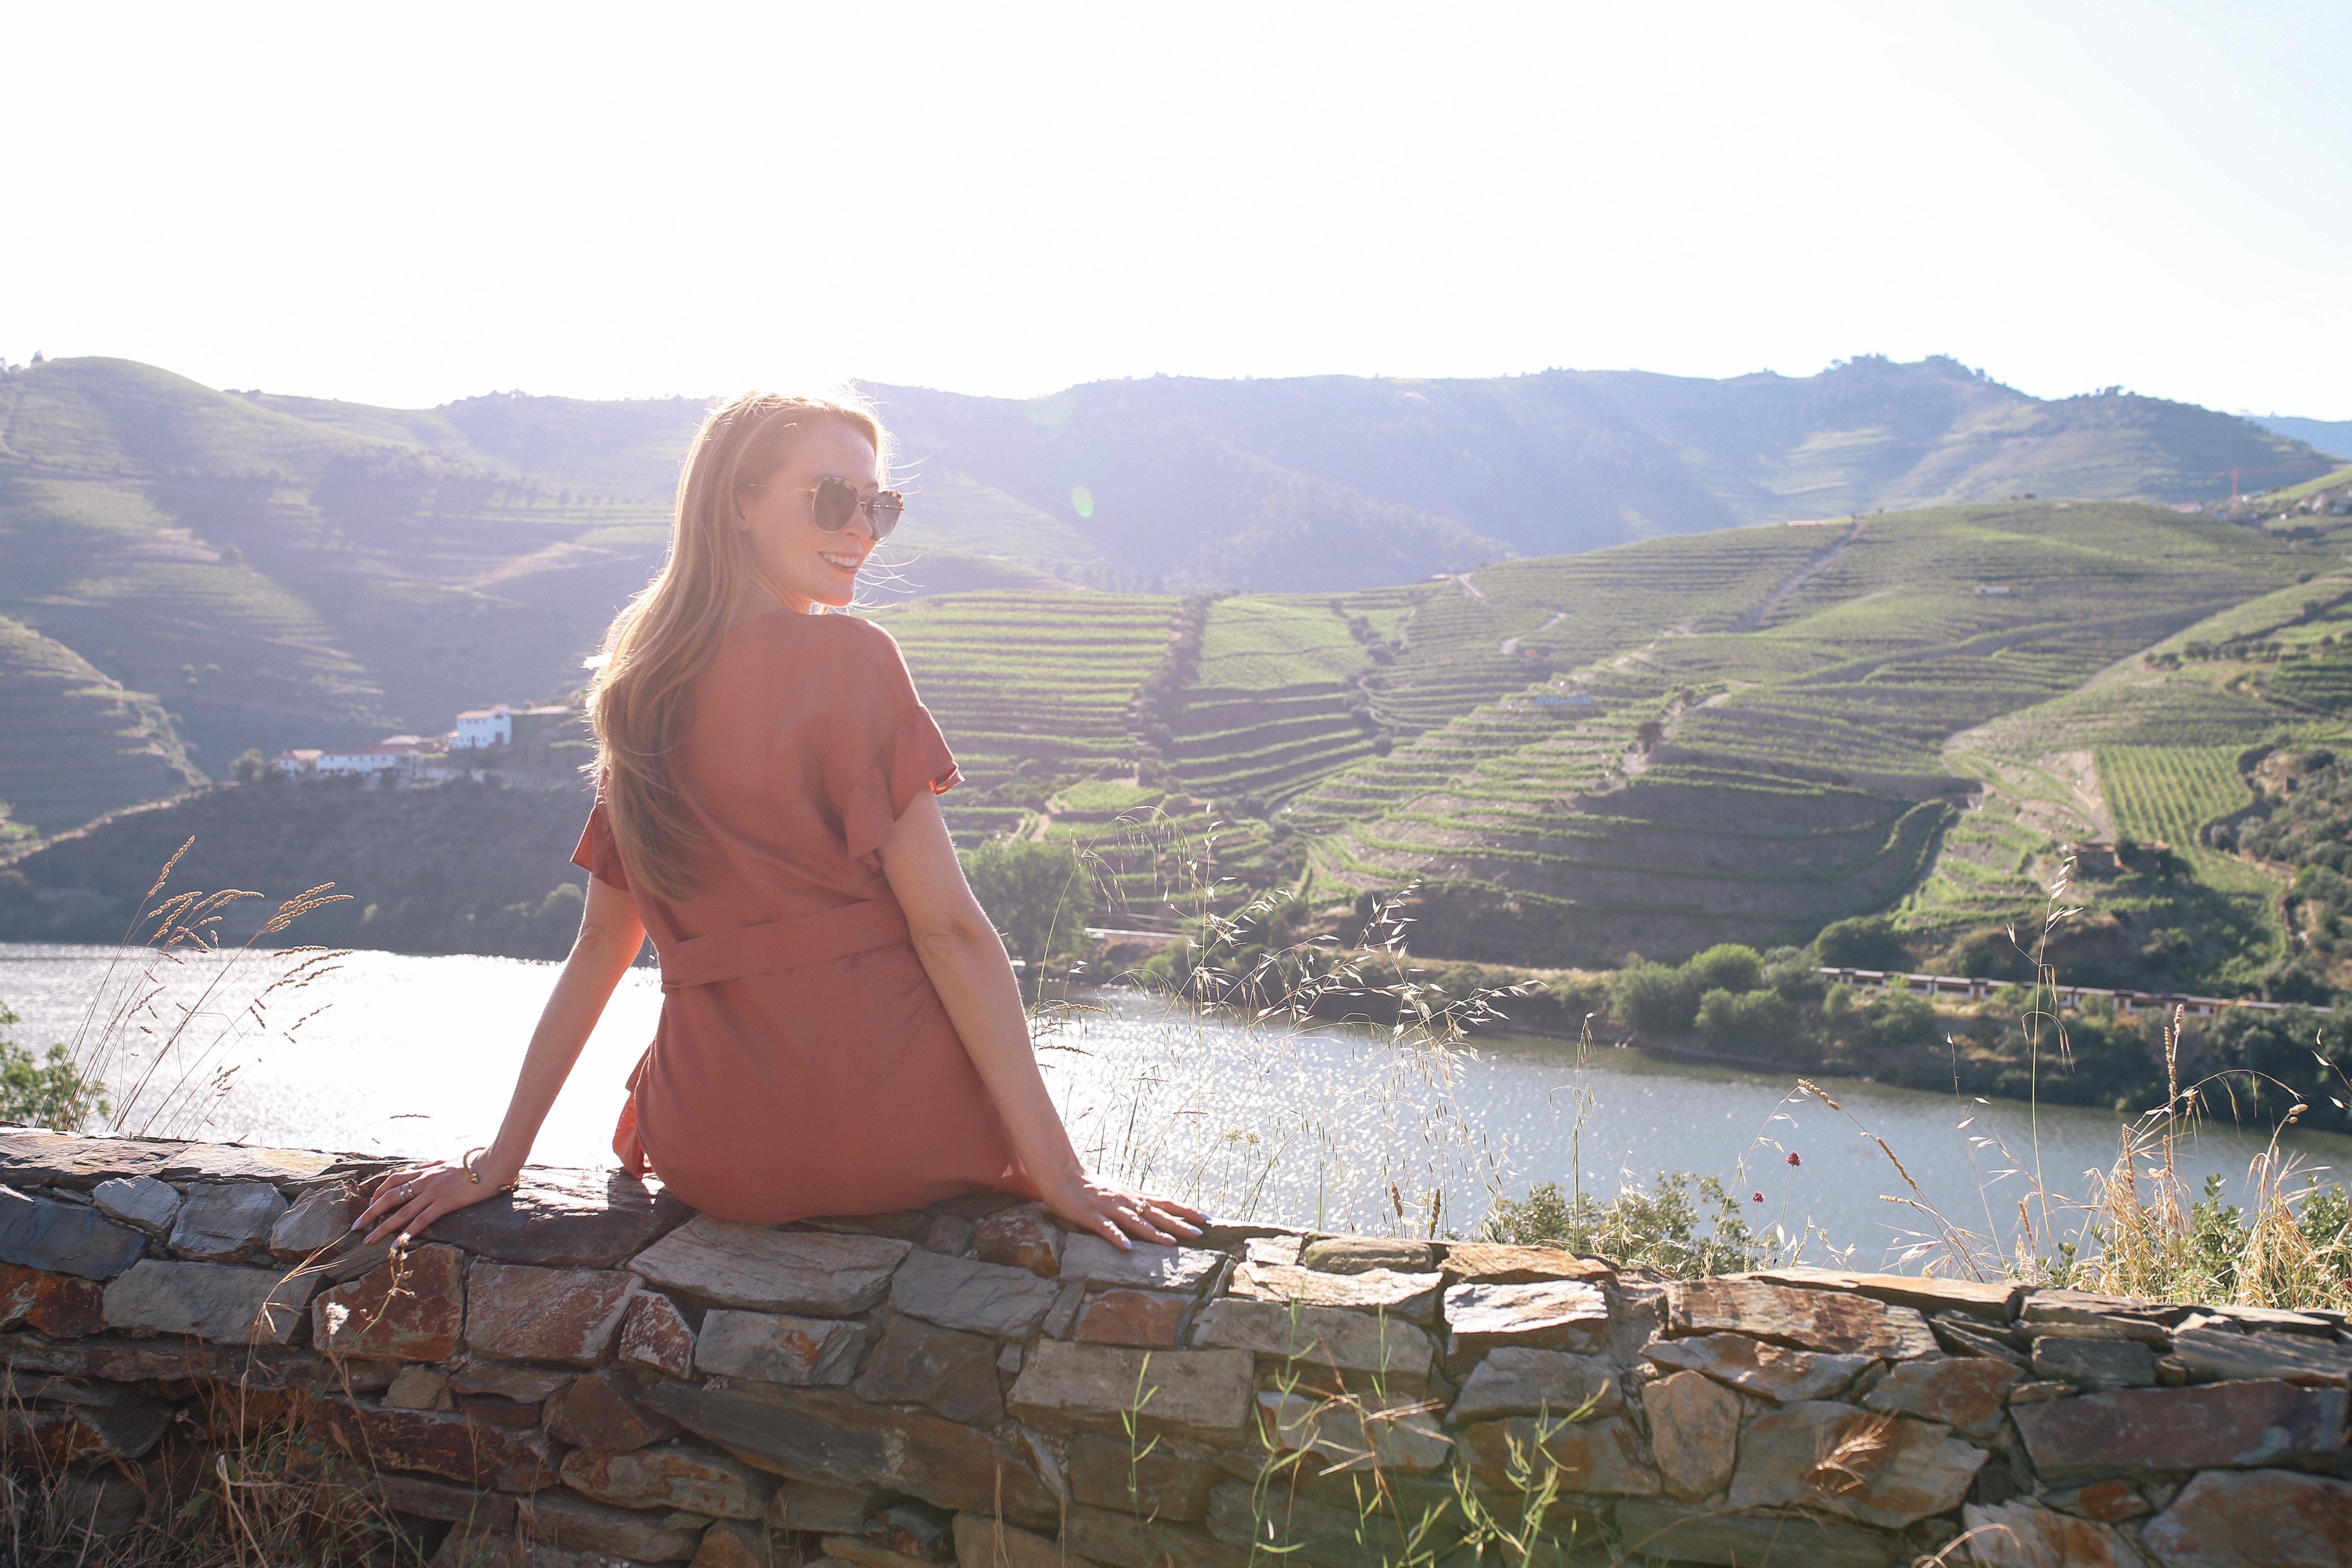 douro valley highway n-222 world's best road